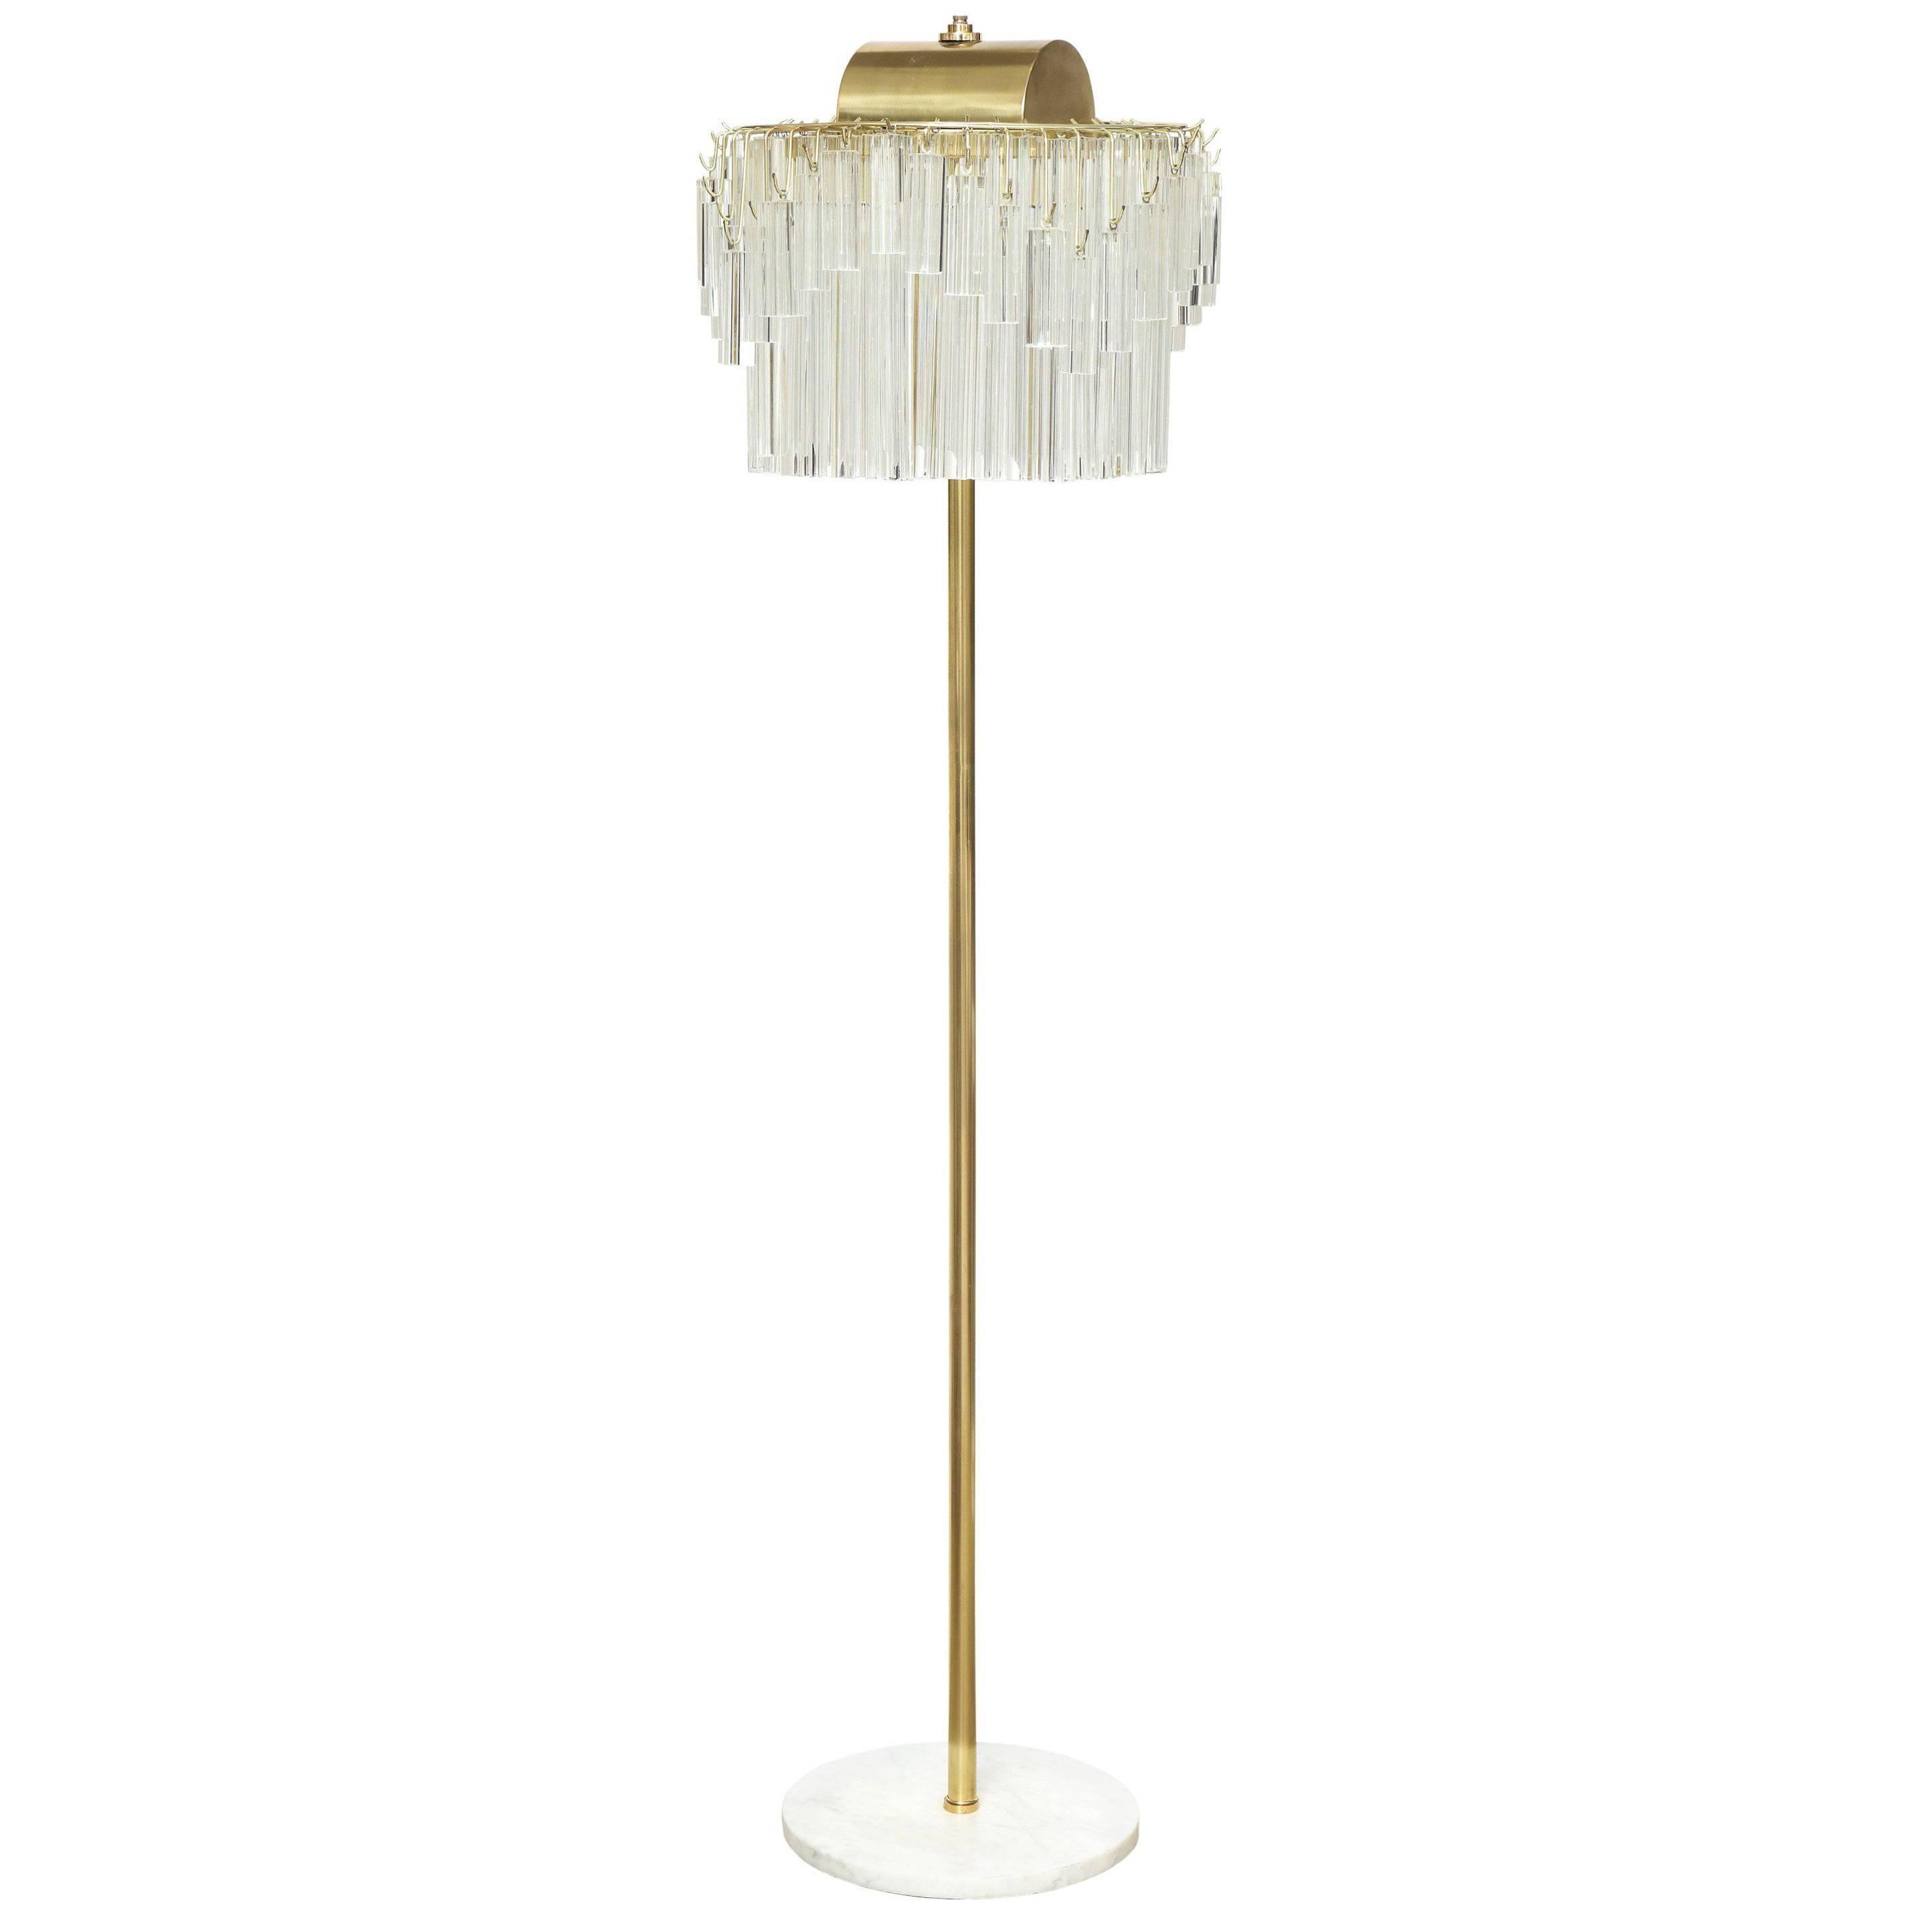 Venini Crystal Prism Floor Lamp